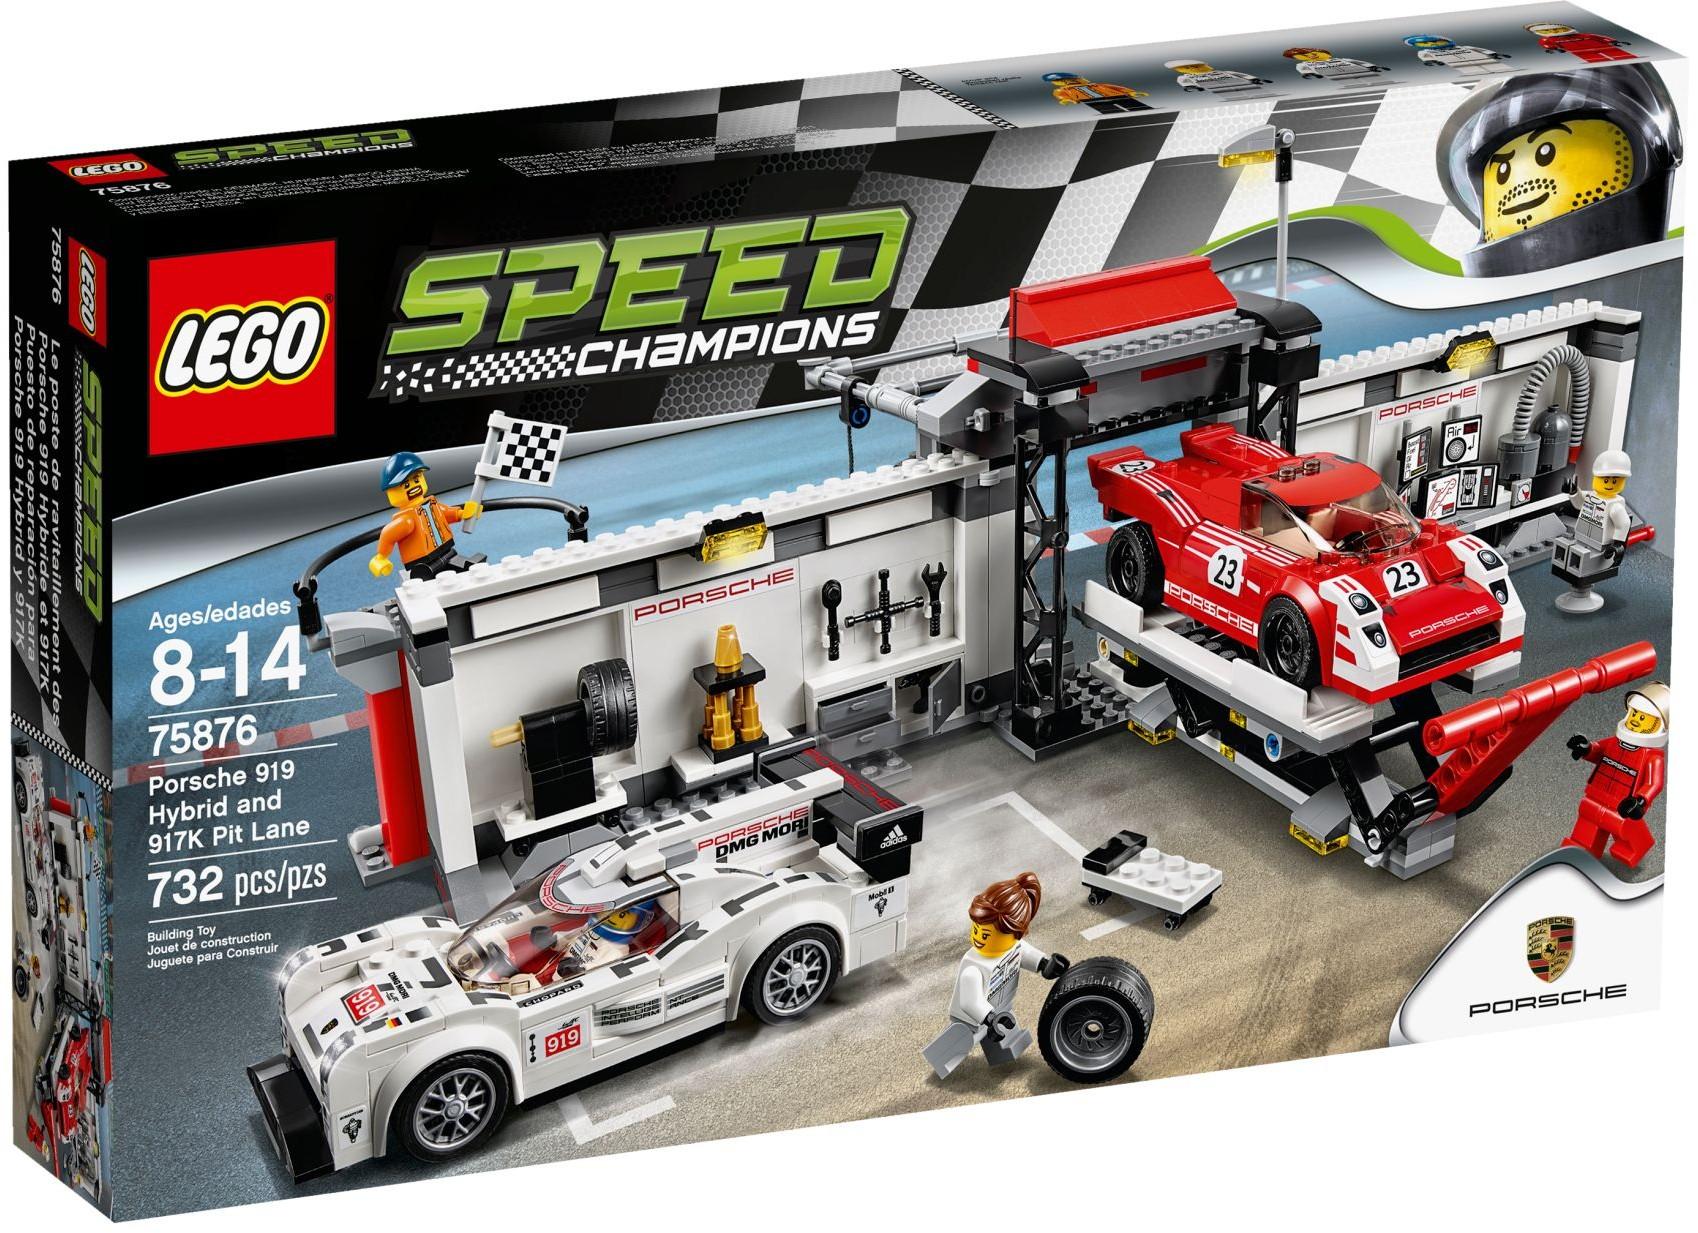 LEGO 75876 - Speed Champions - Porsche 919 Hybrid and 917K Pit Lane